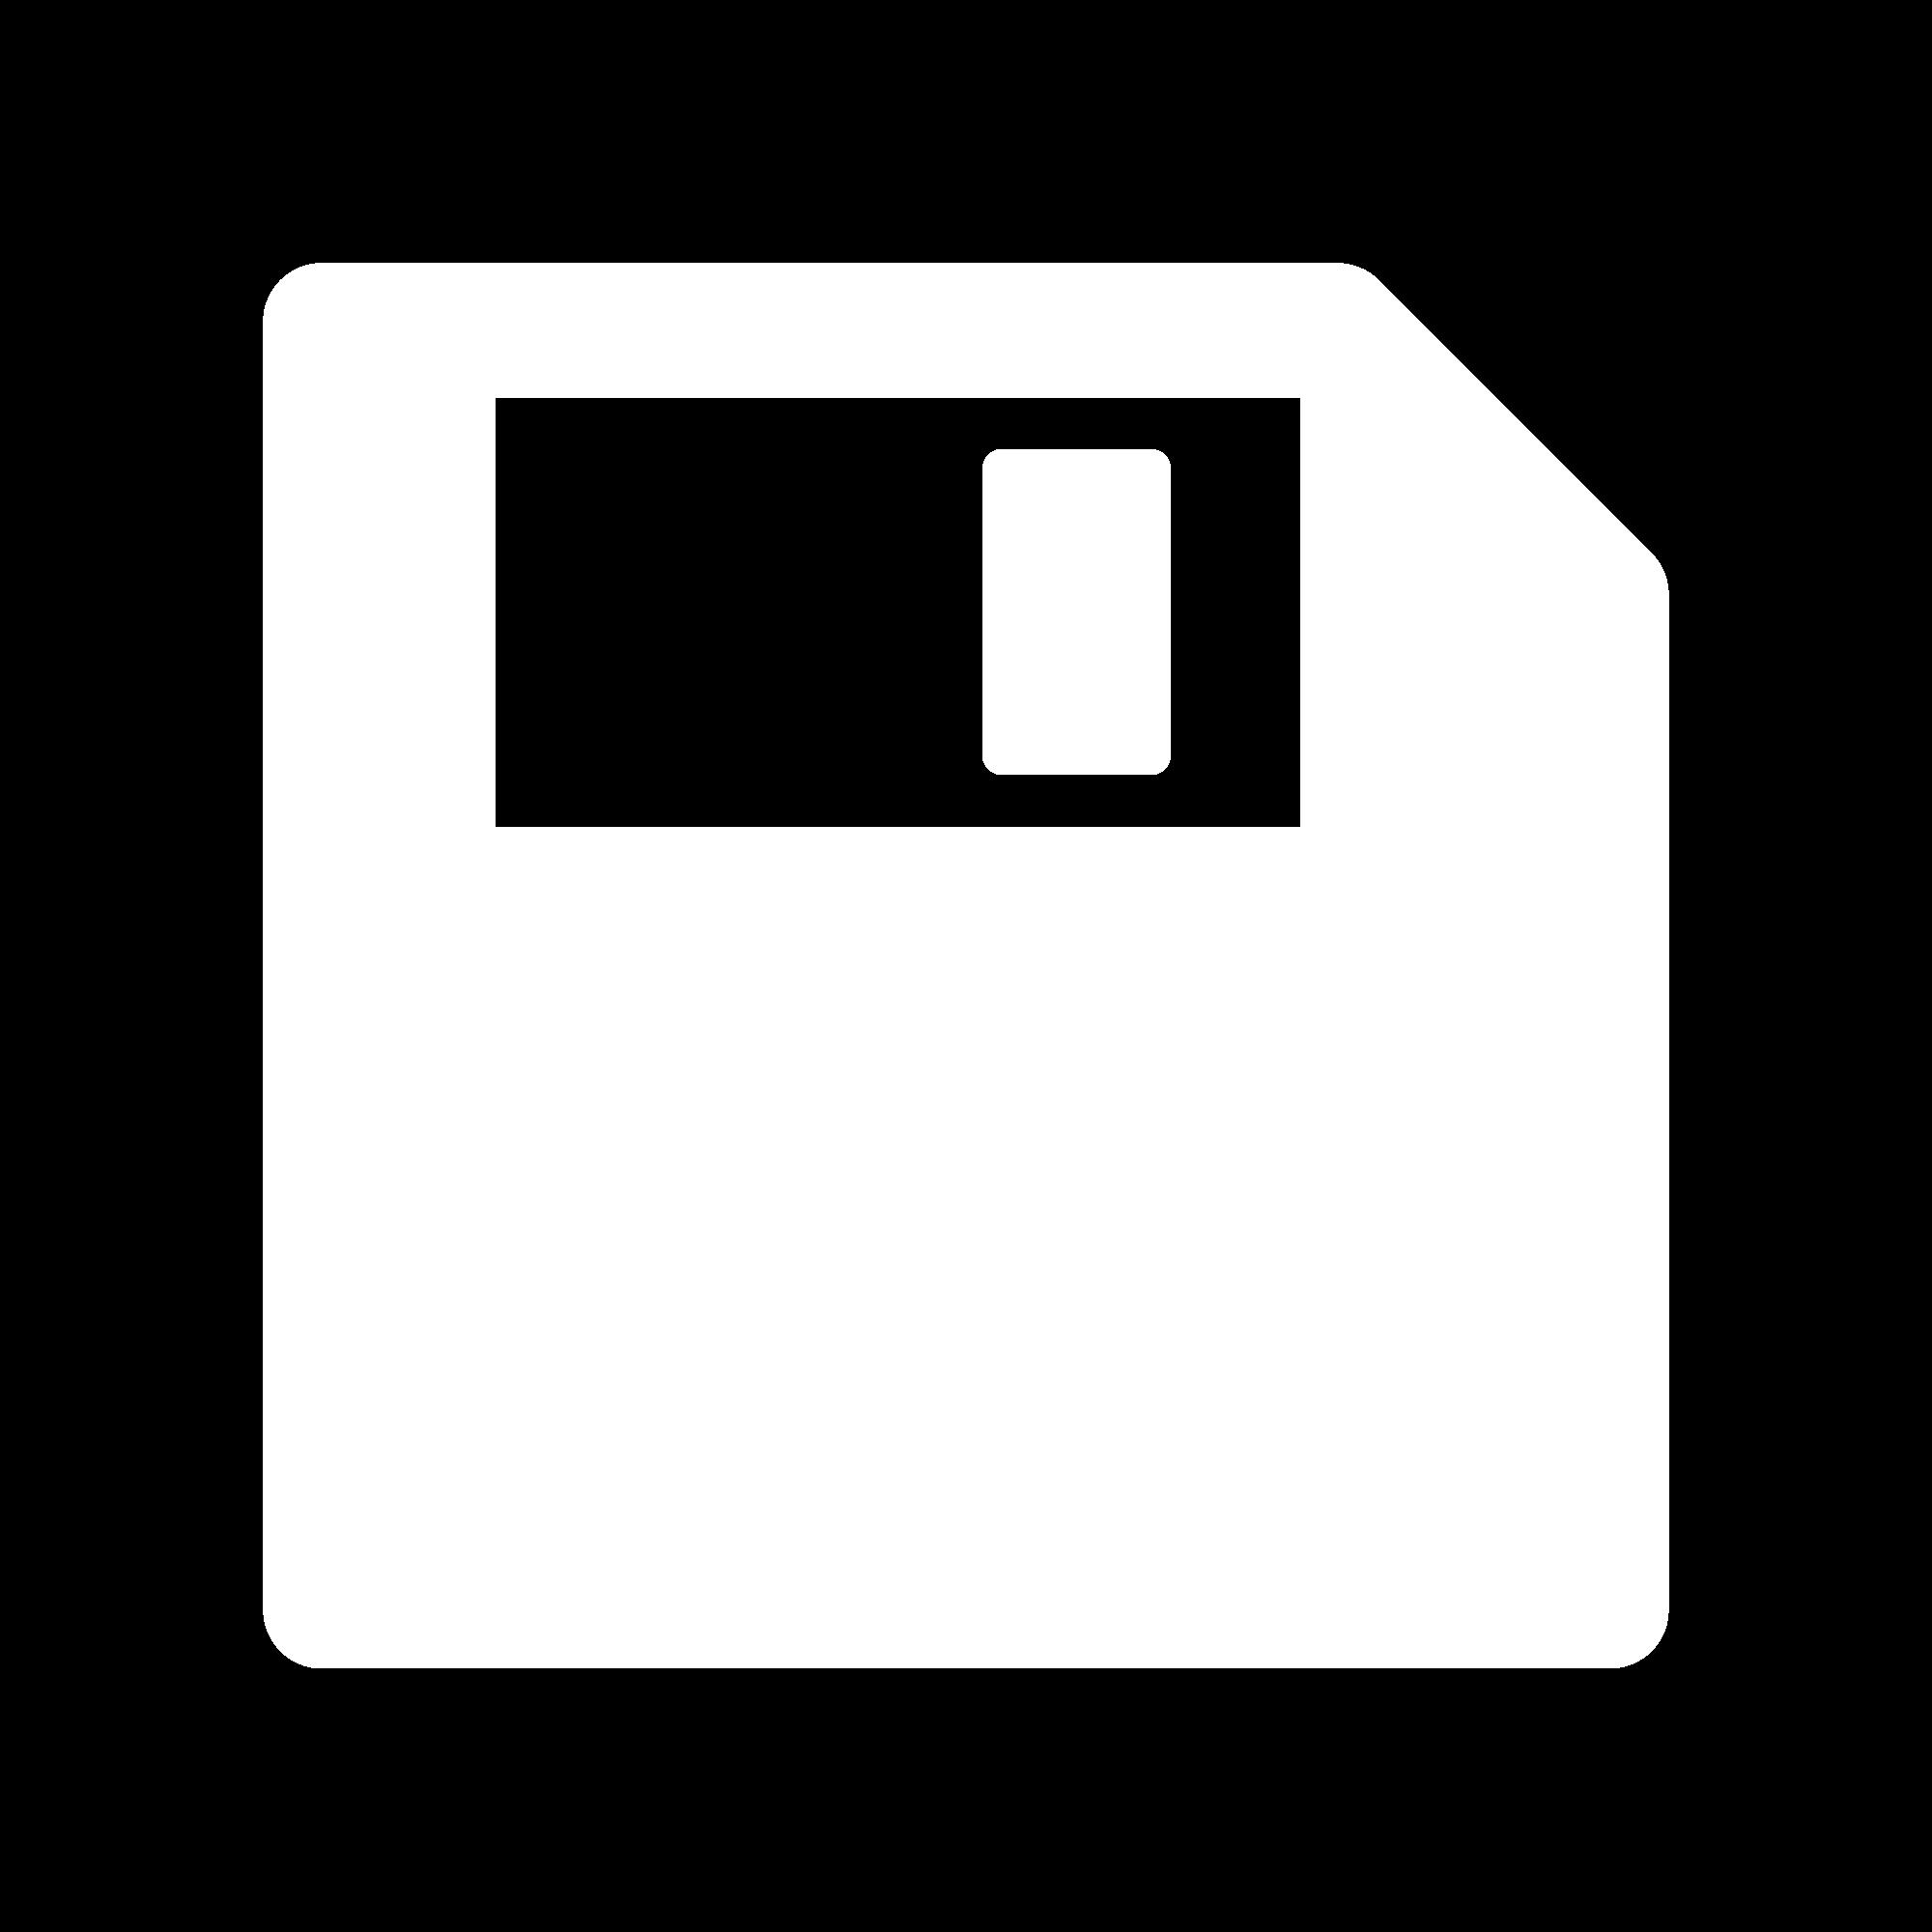 vector transparent stock save svg antu document #115475972